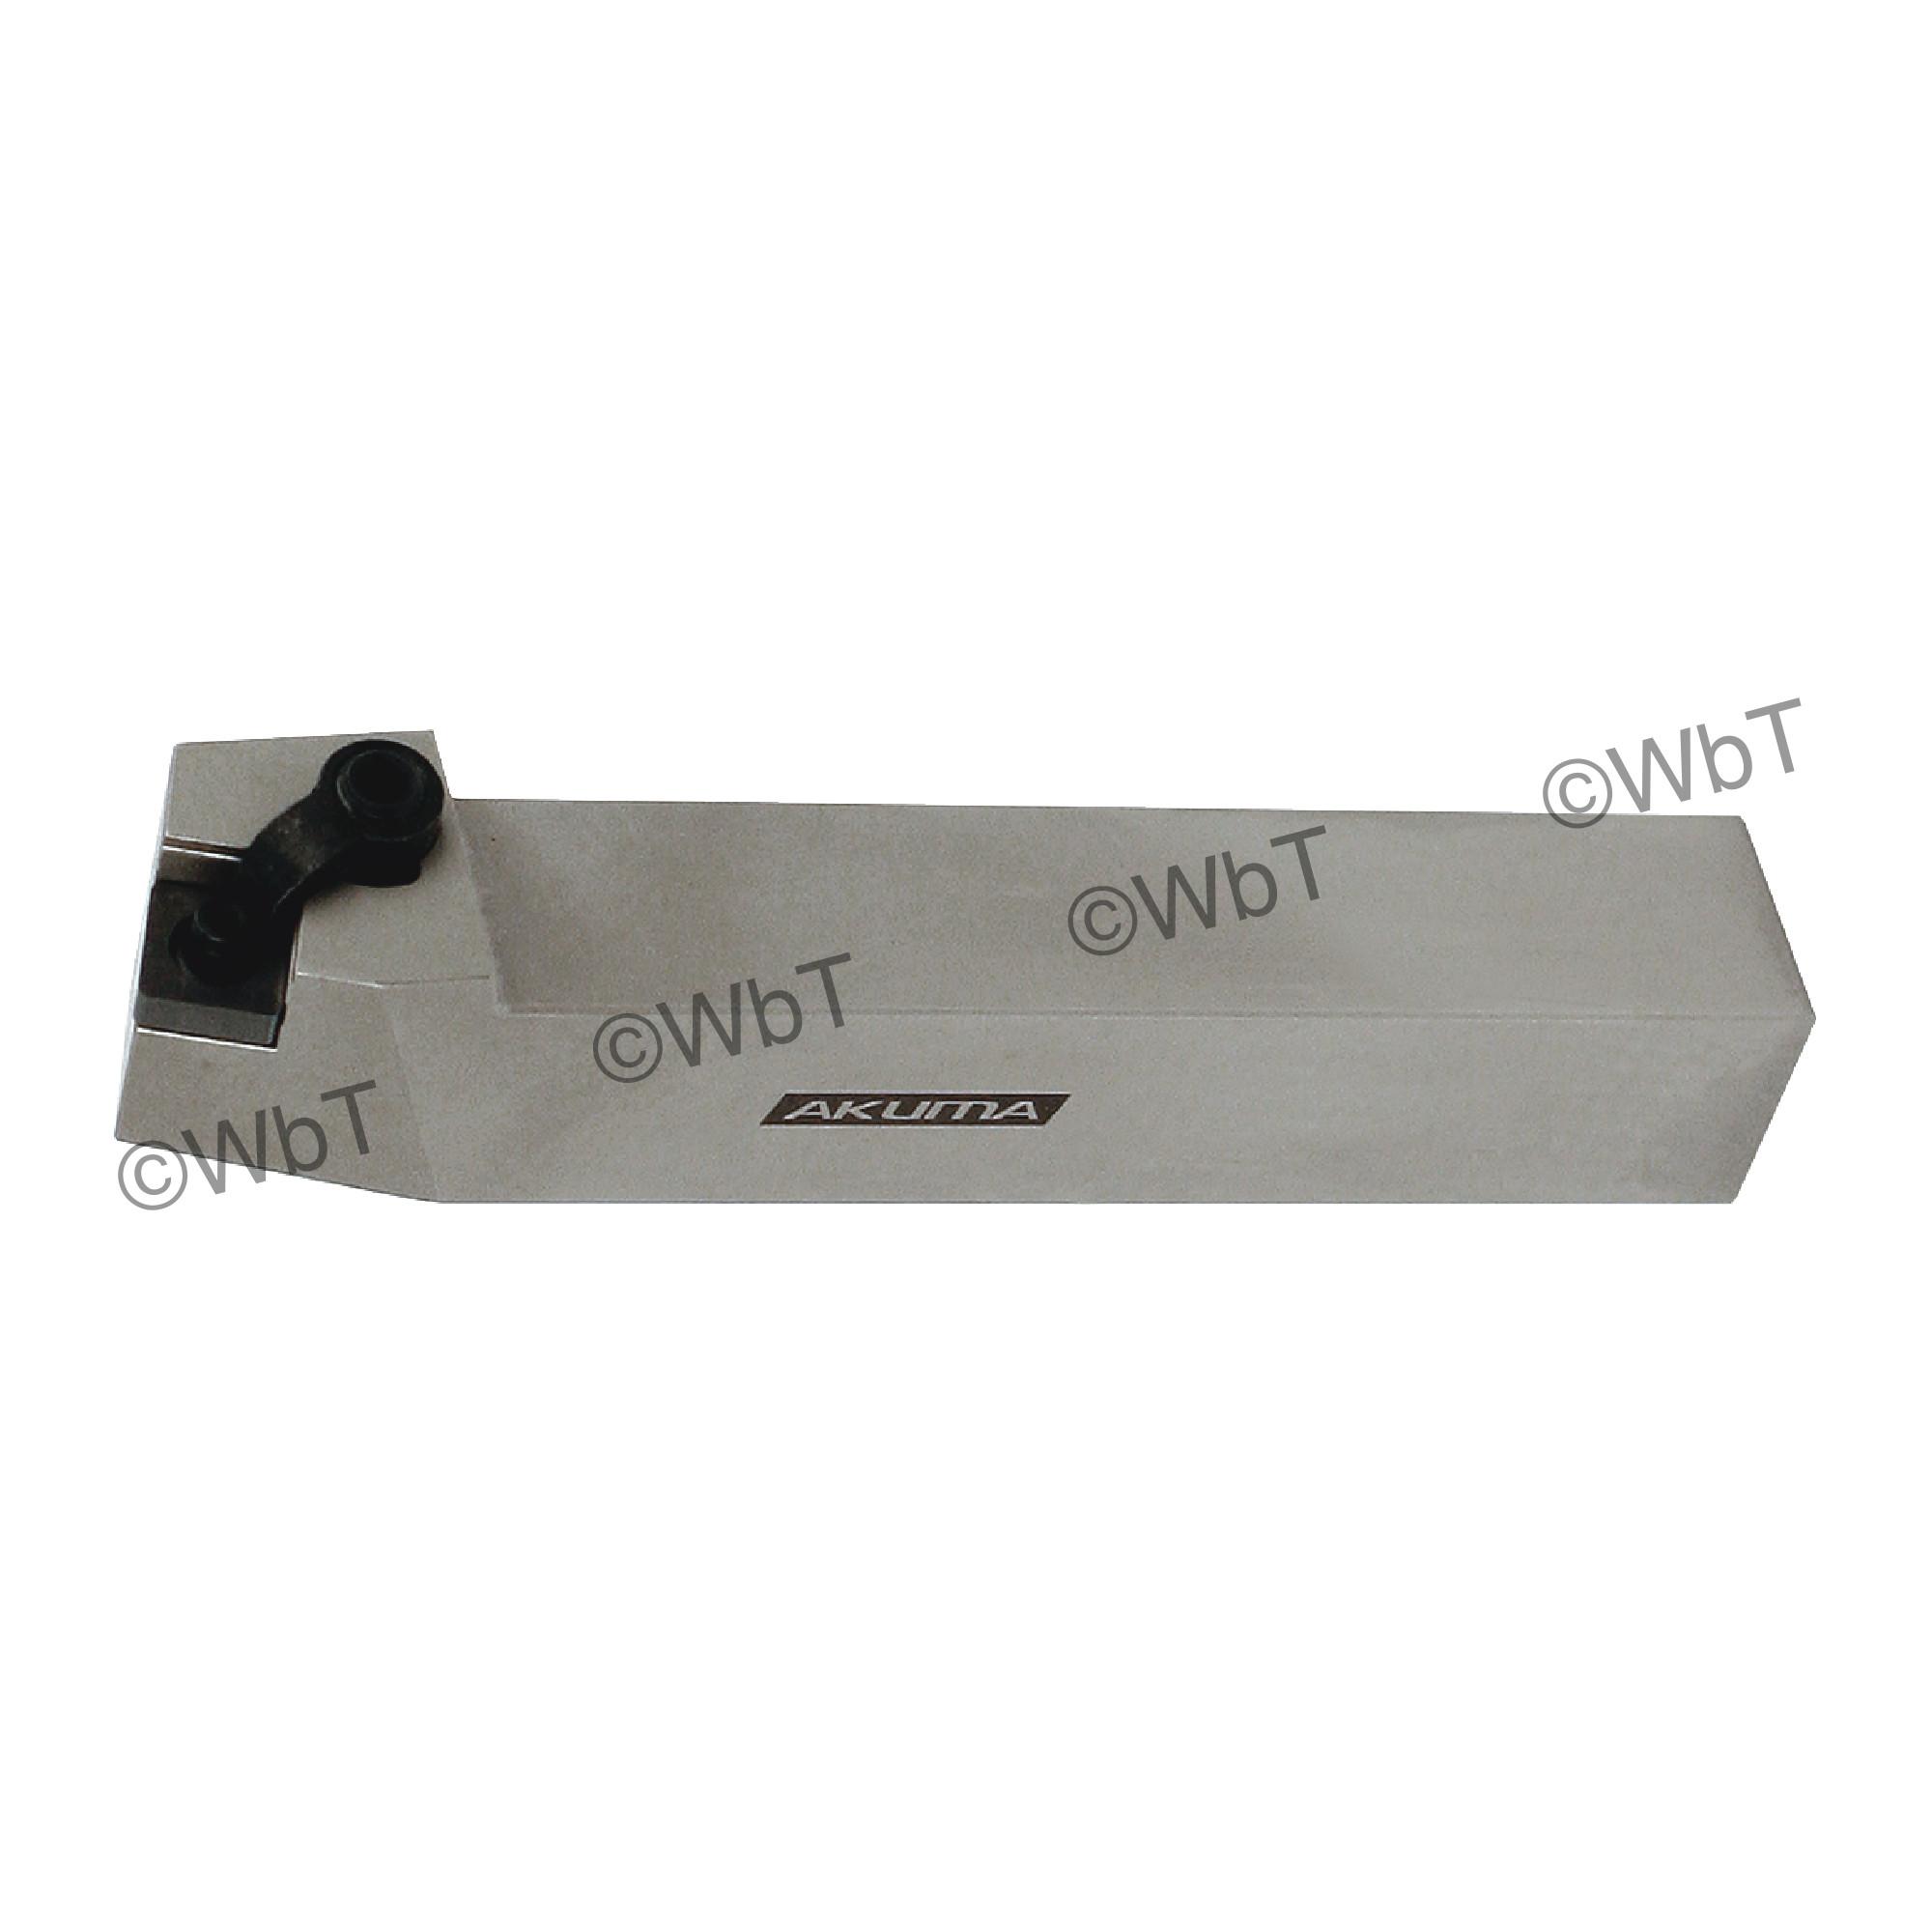 "AKUMA - MSBNR16-4D / 1.000"" External Turning Holder for SNMG43_ Inserts / Right Hand"